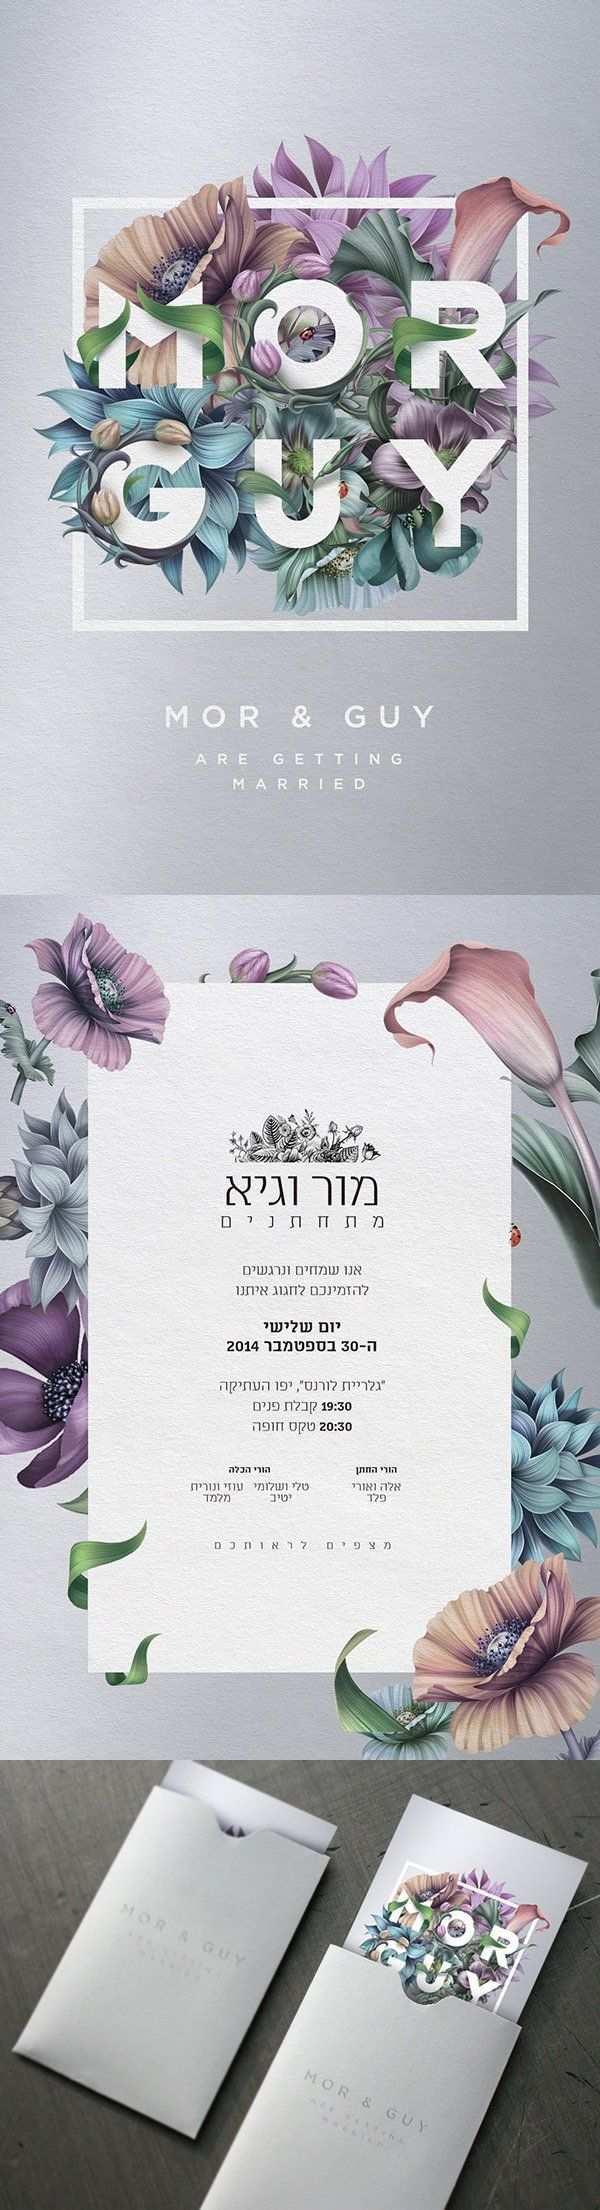 A Showcase Of 50 Beautifully Designed Print Invitations To Inspire You Grafik Design Logos Grafikdesign Inspiration Blumen Logo